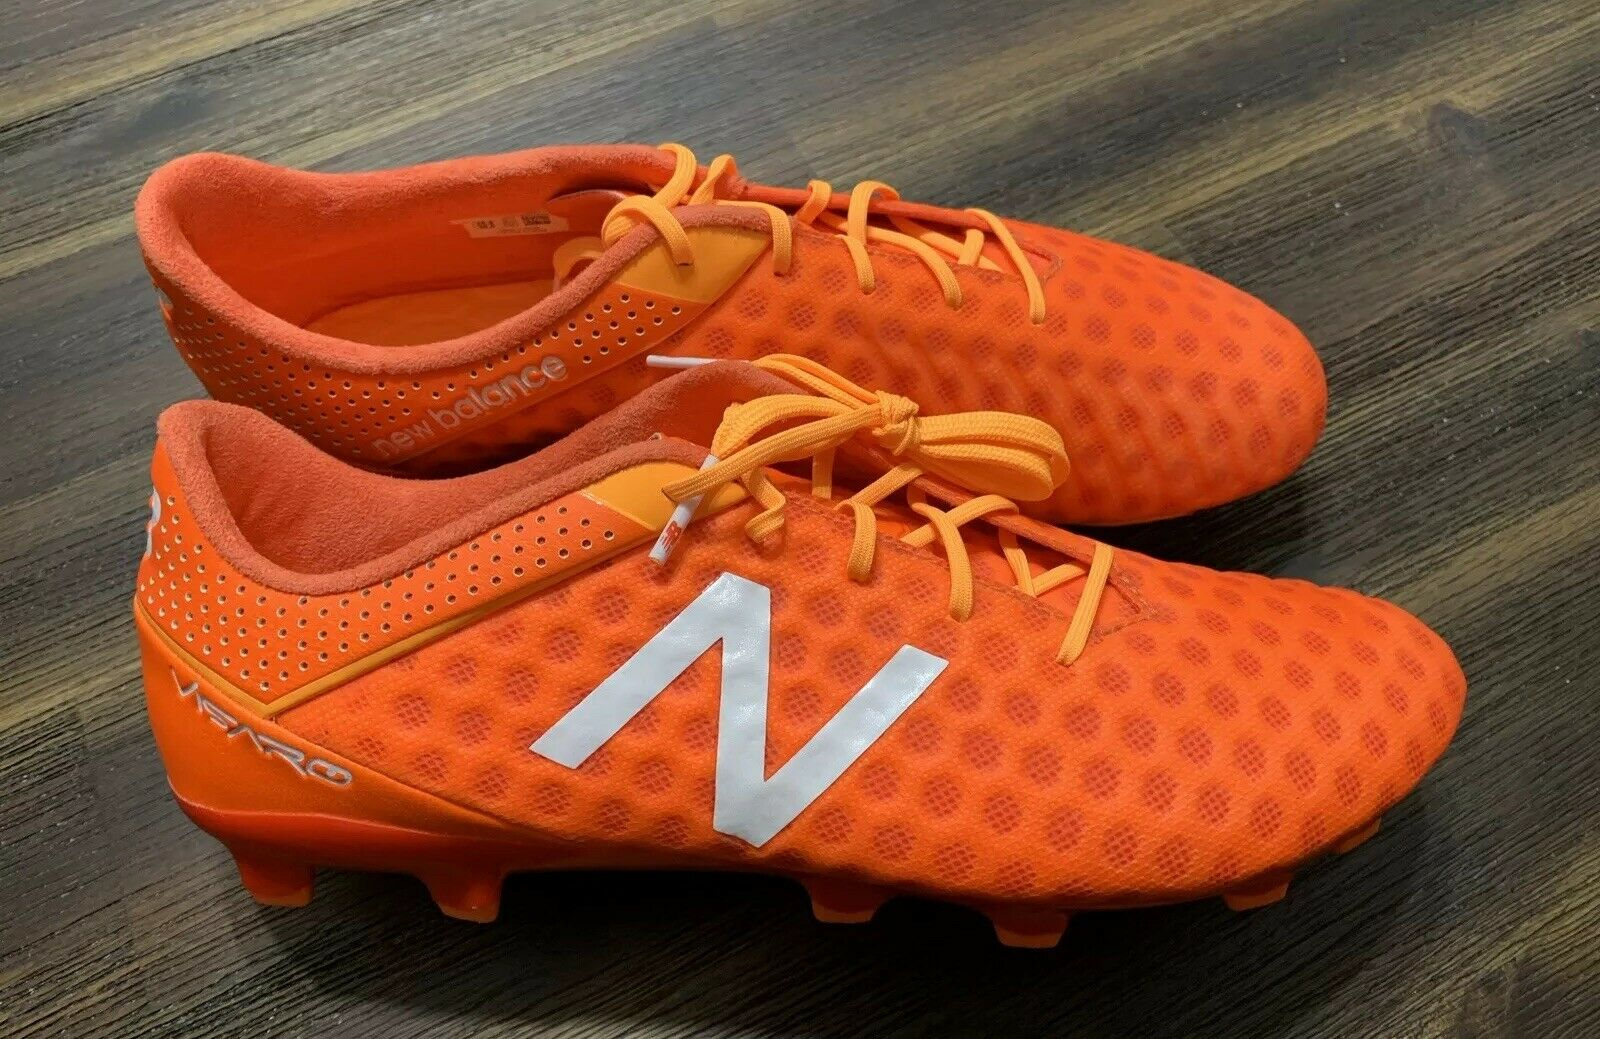 NEW BALANCE VISARO MSVRCFLF Soccer Cleats Sz 11.5 D Rare Orange